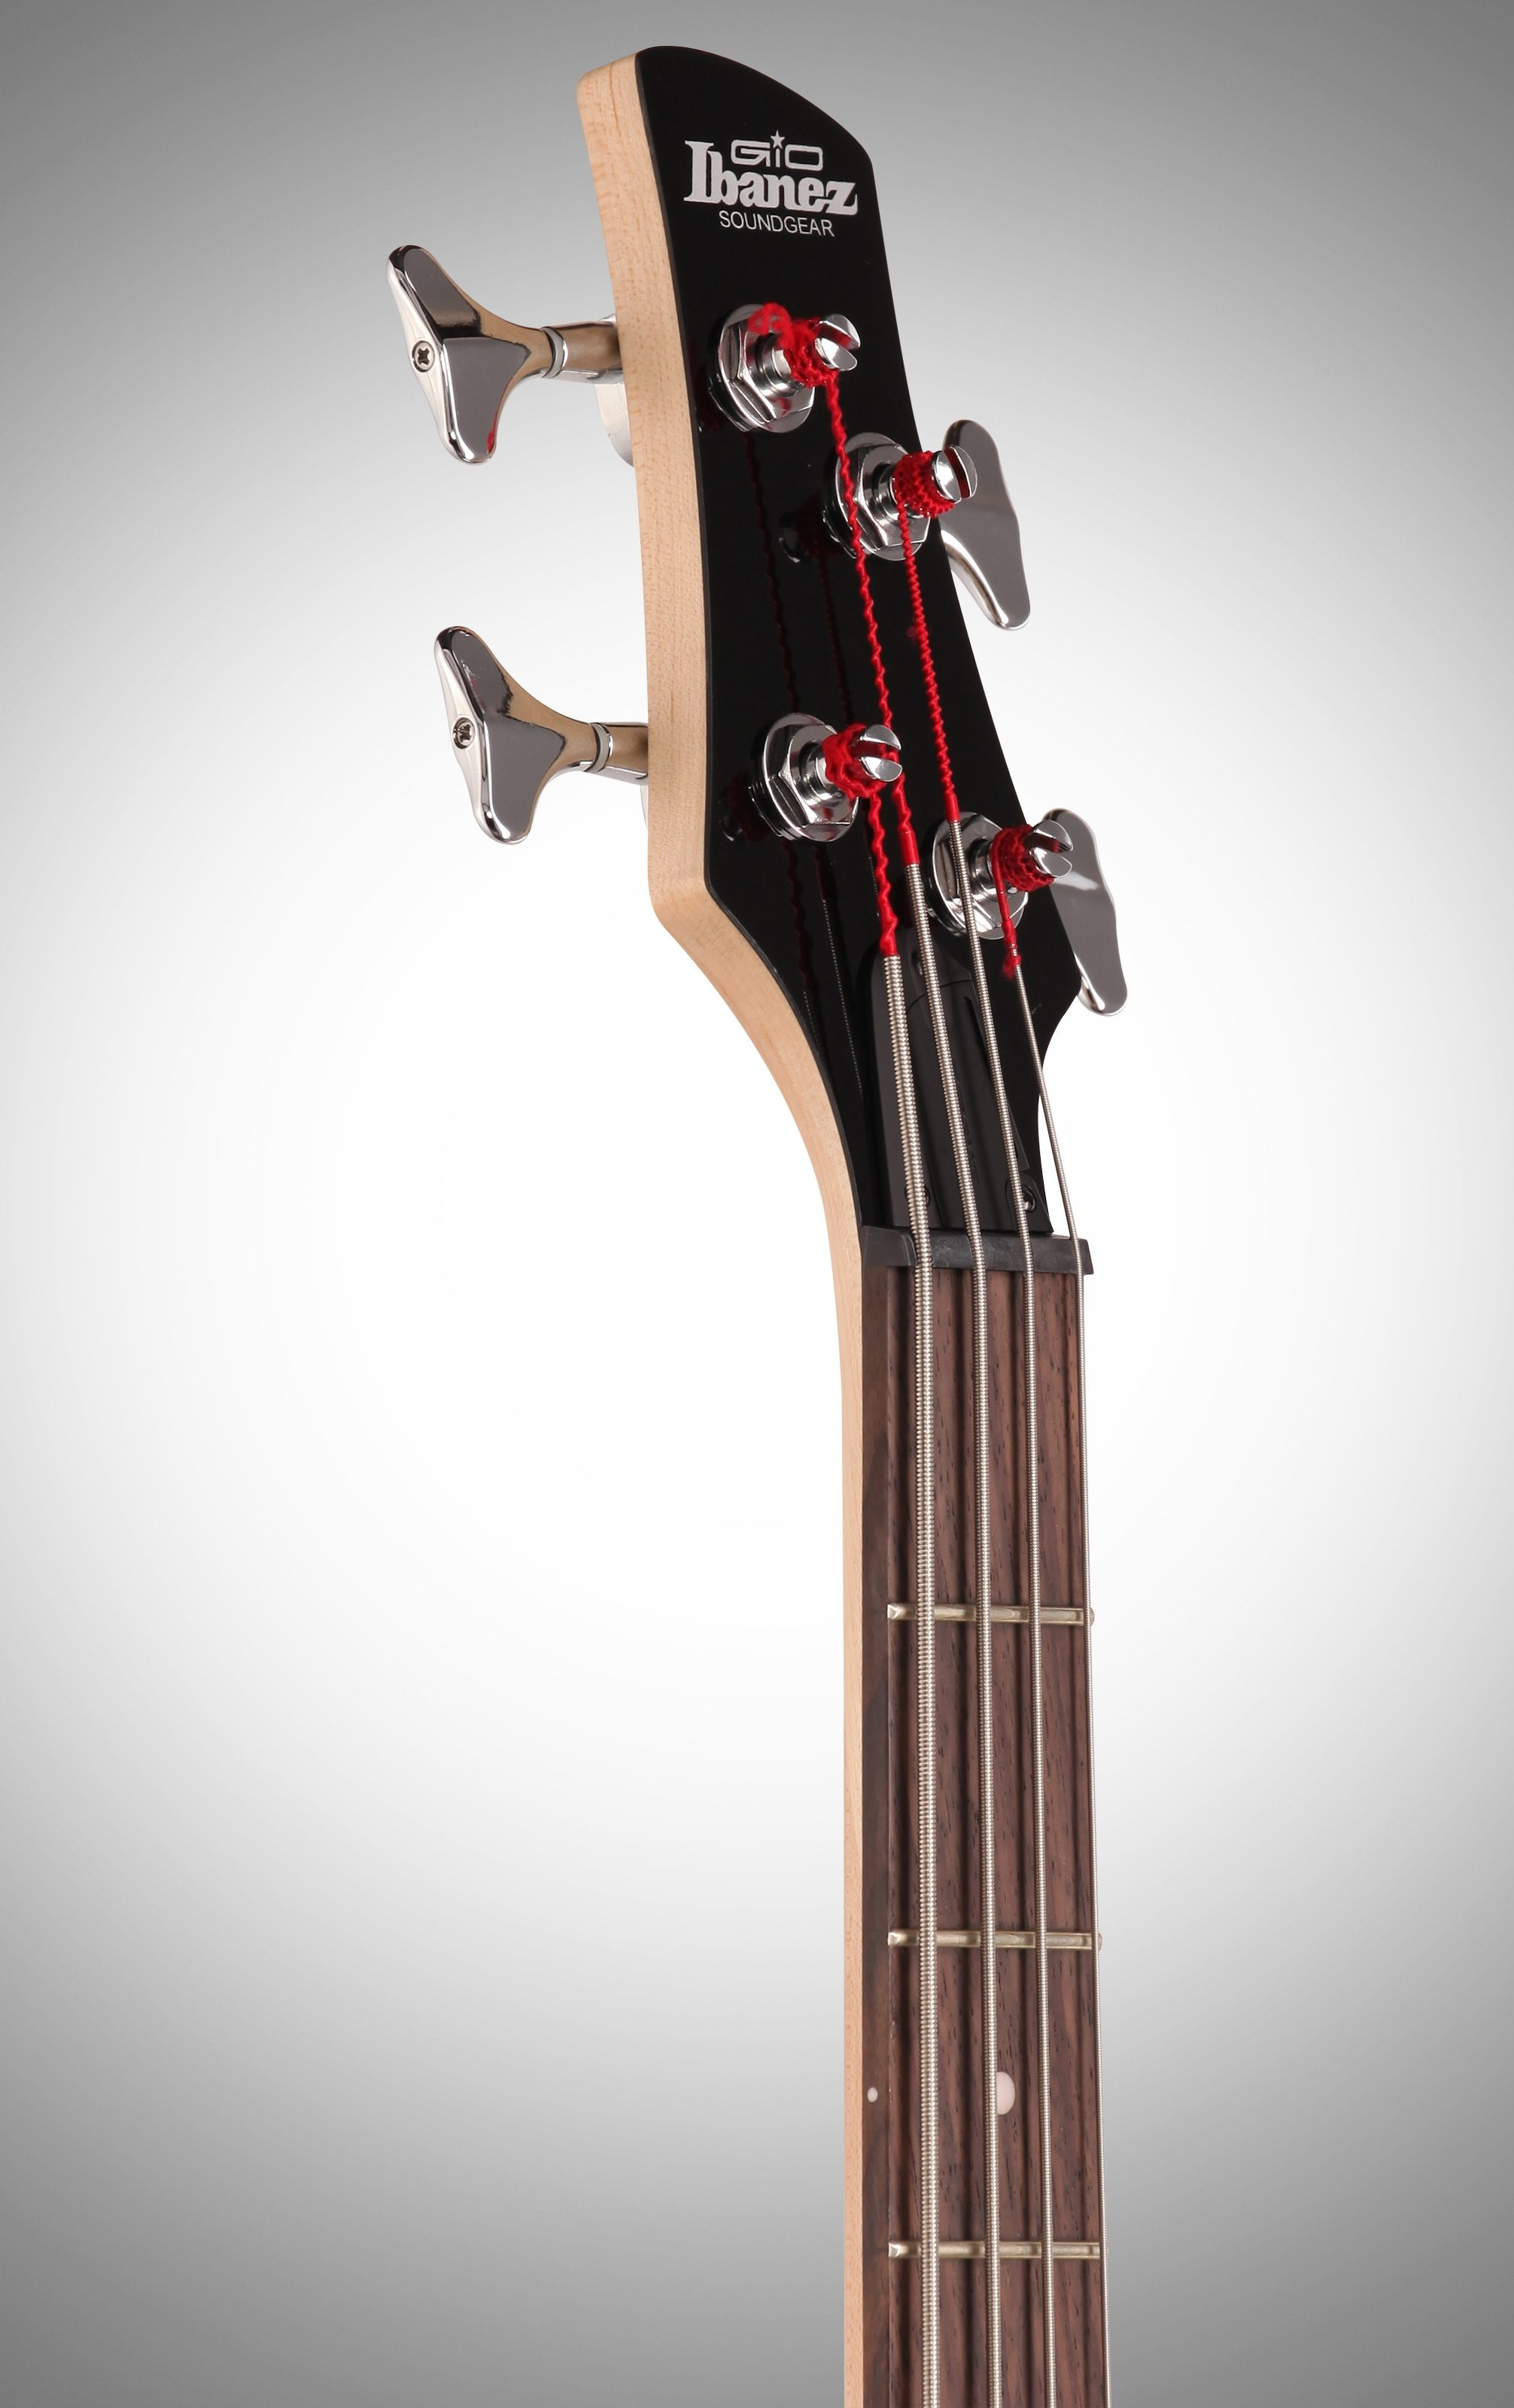 Ibanez Gsr200 Electric Bass Jewel Blue